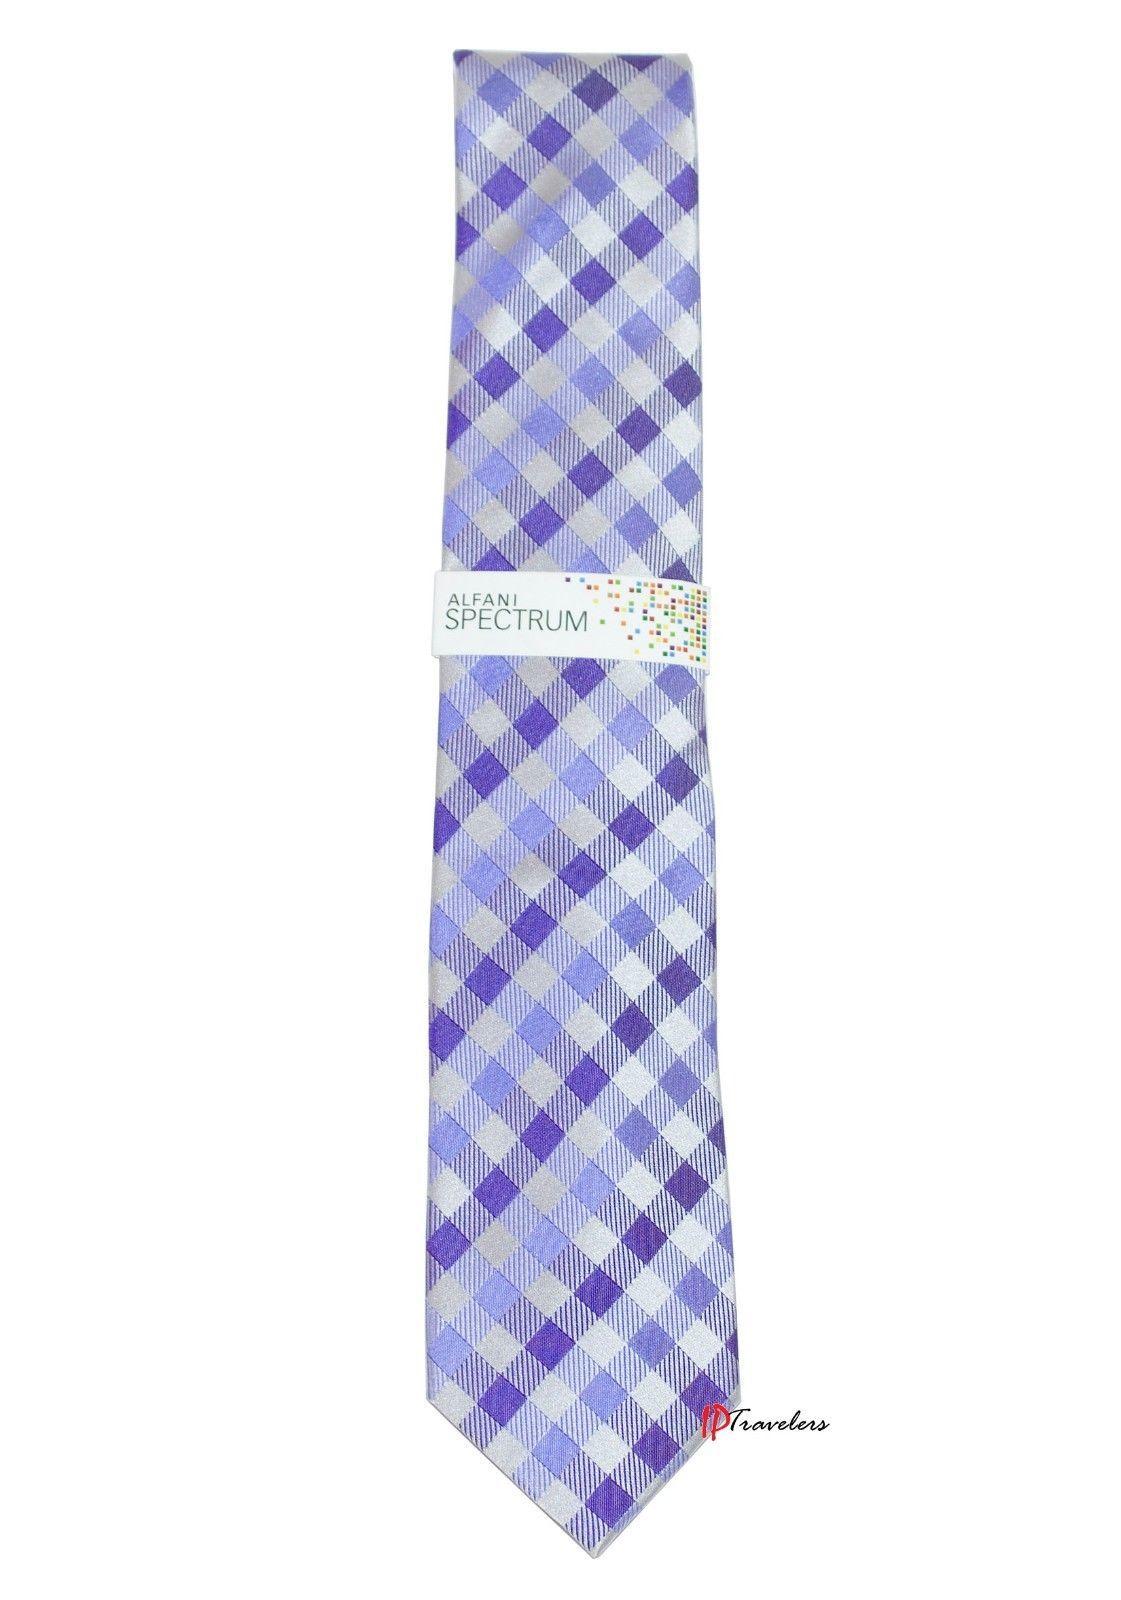 Alfani Spectrum Men's Neck Tie Gingham Light Purple Checkered 100% Silk $49.50